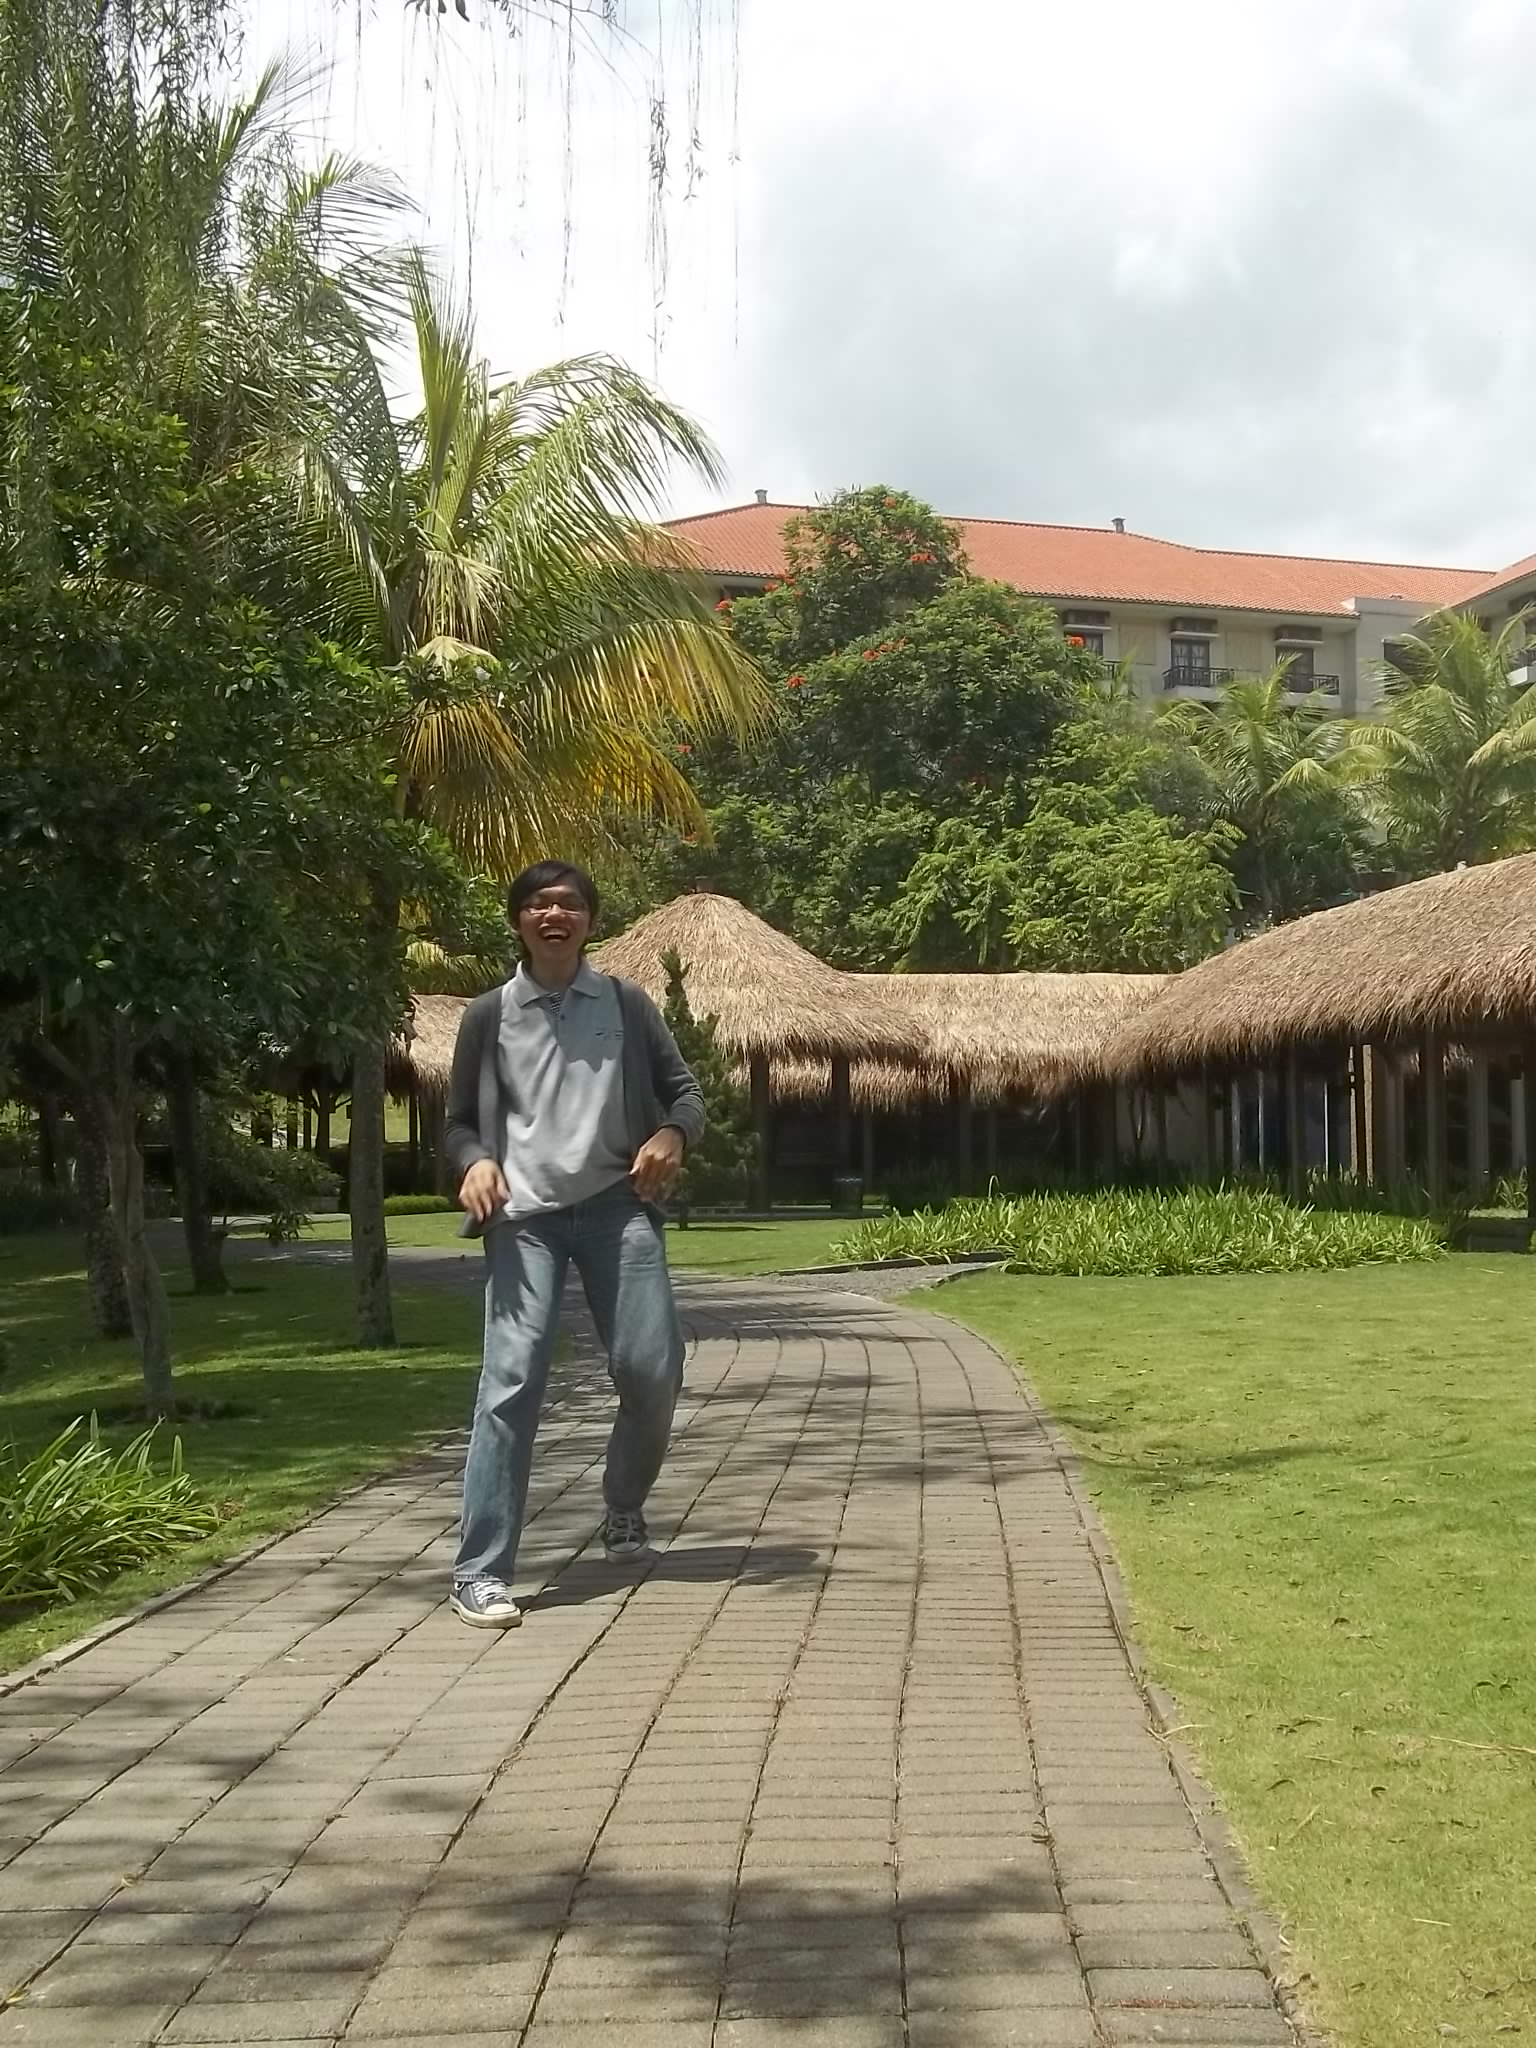 Nearest major airport to Majalengka, Indonesia: - Travelmath